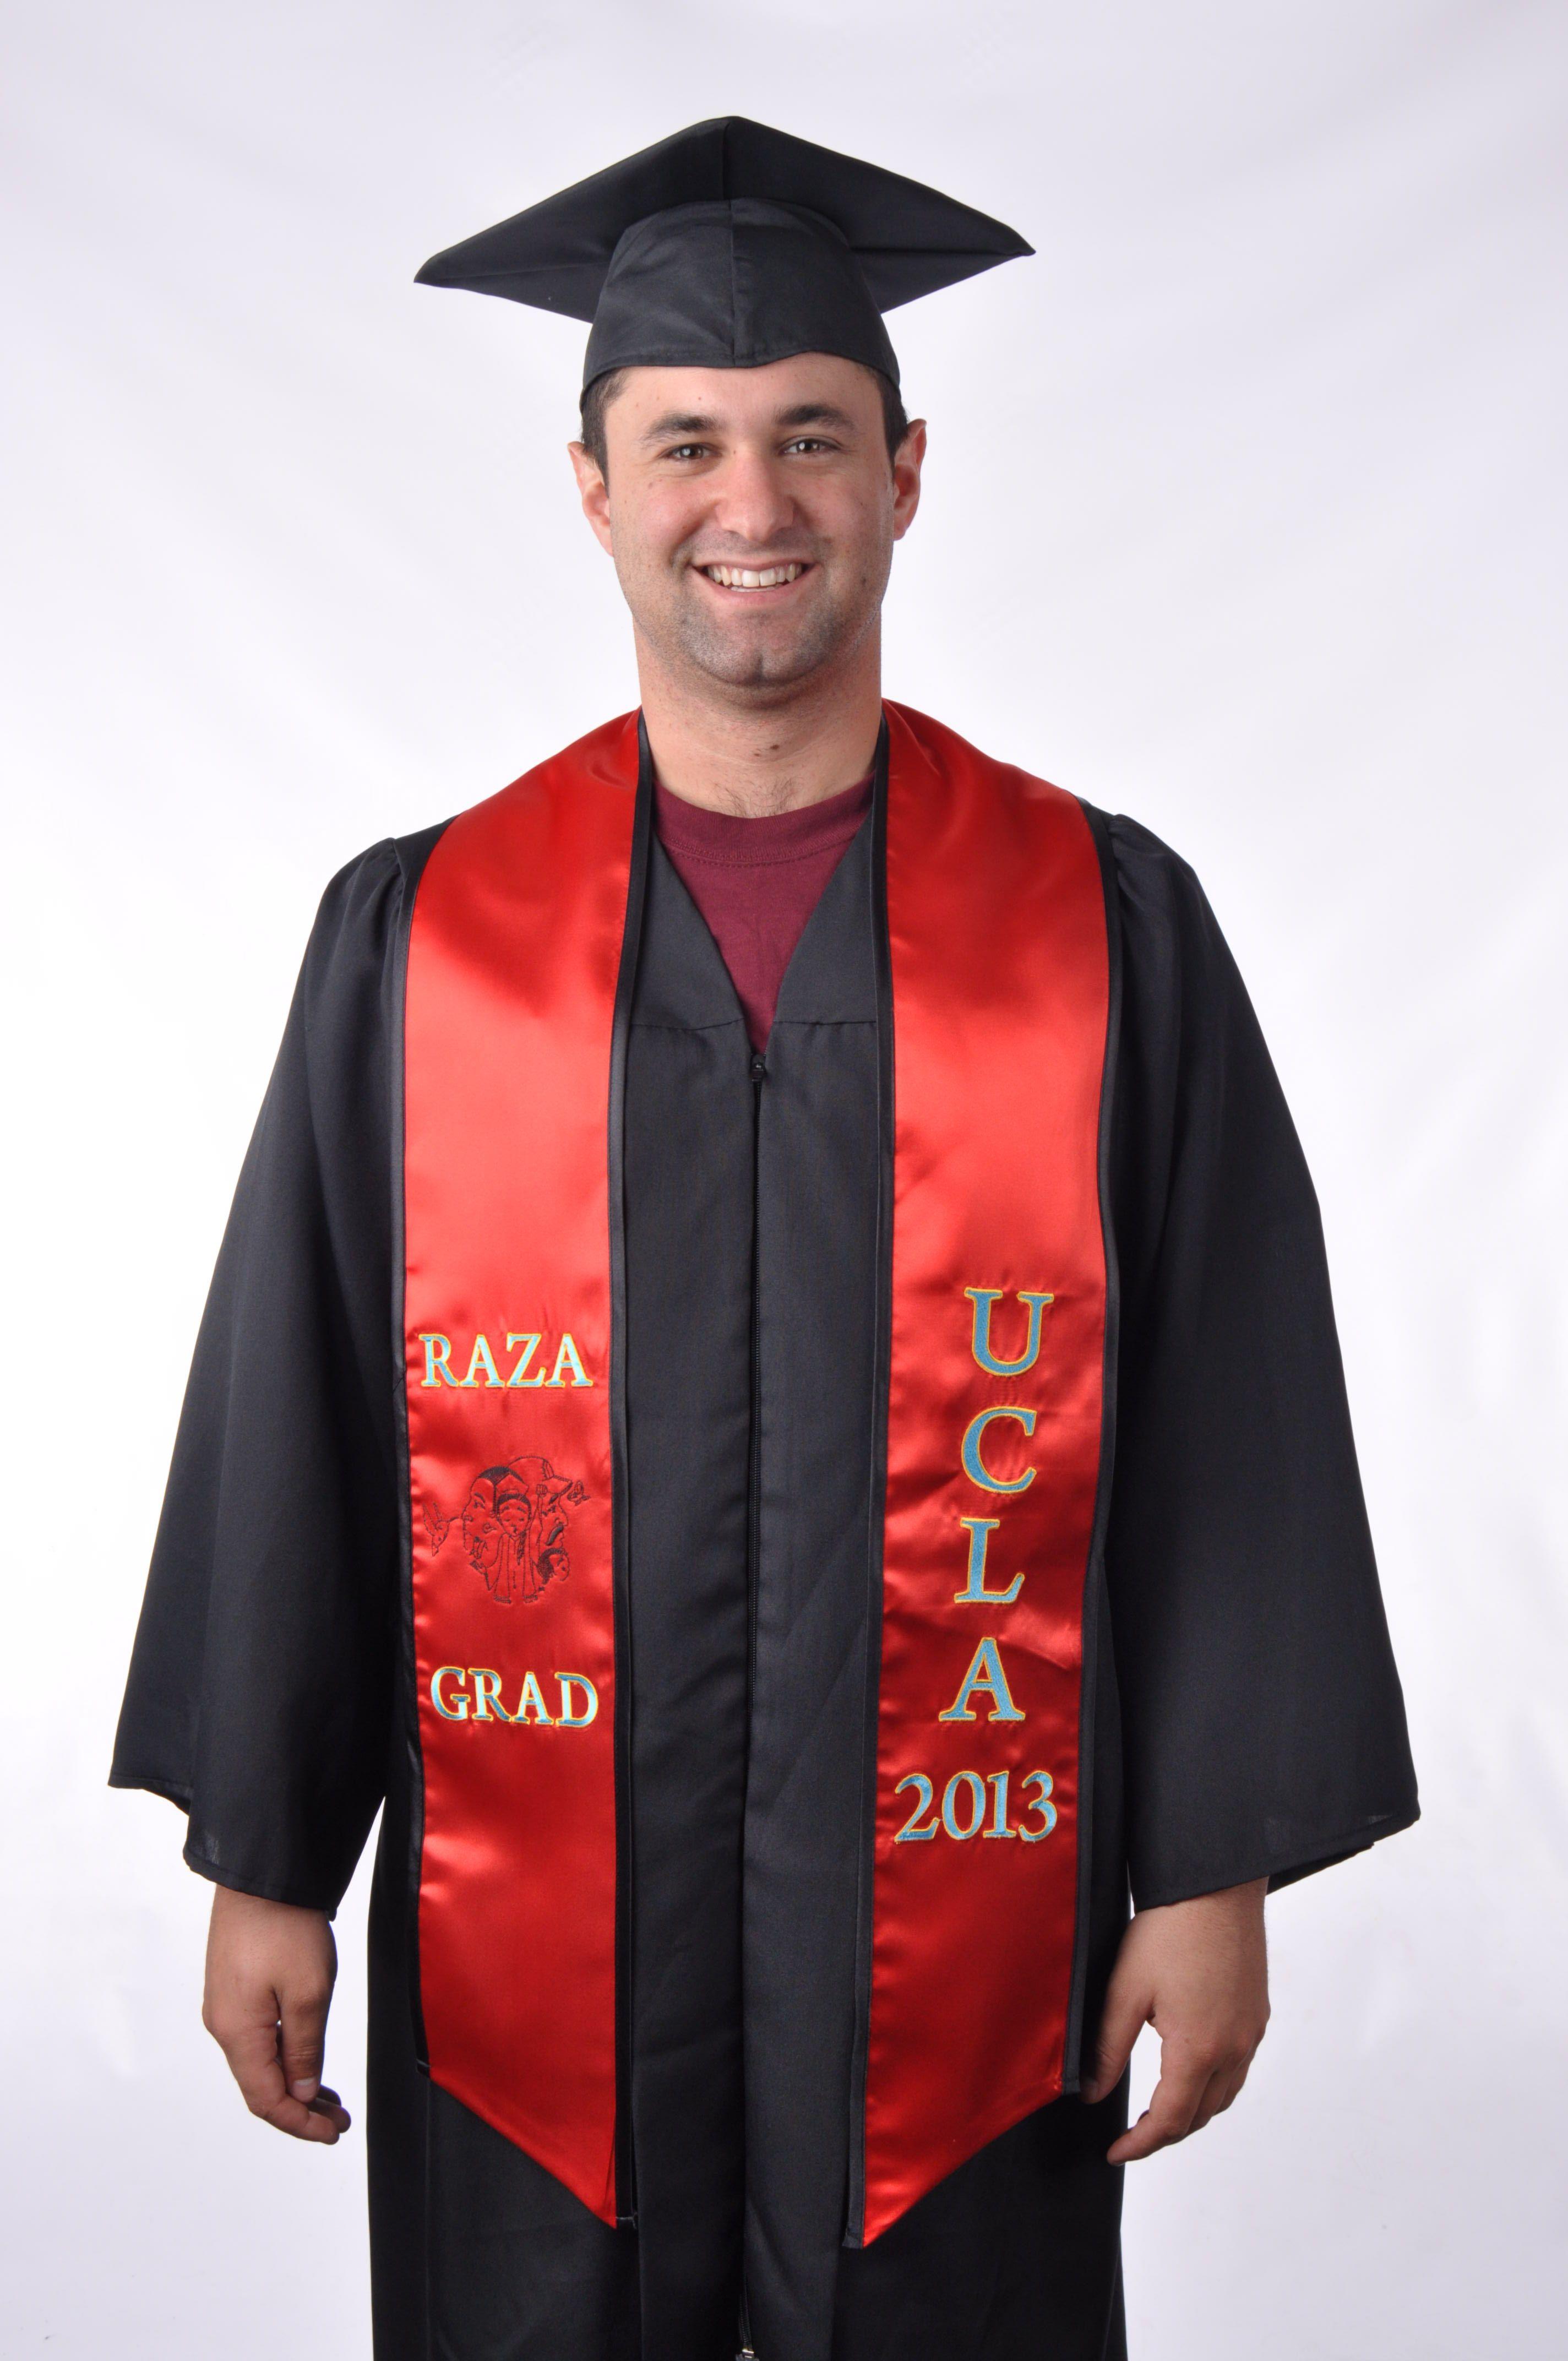 Graduation Sash and Stoles | New Sash Ideas | Pinterest